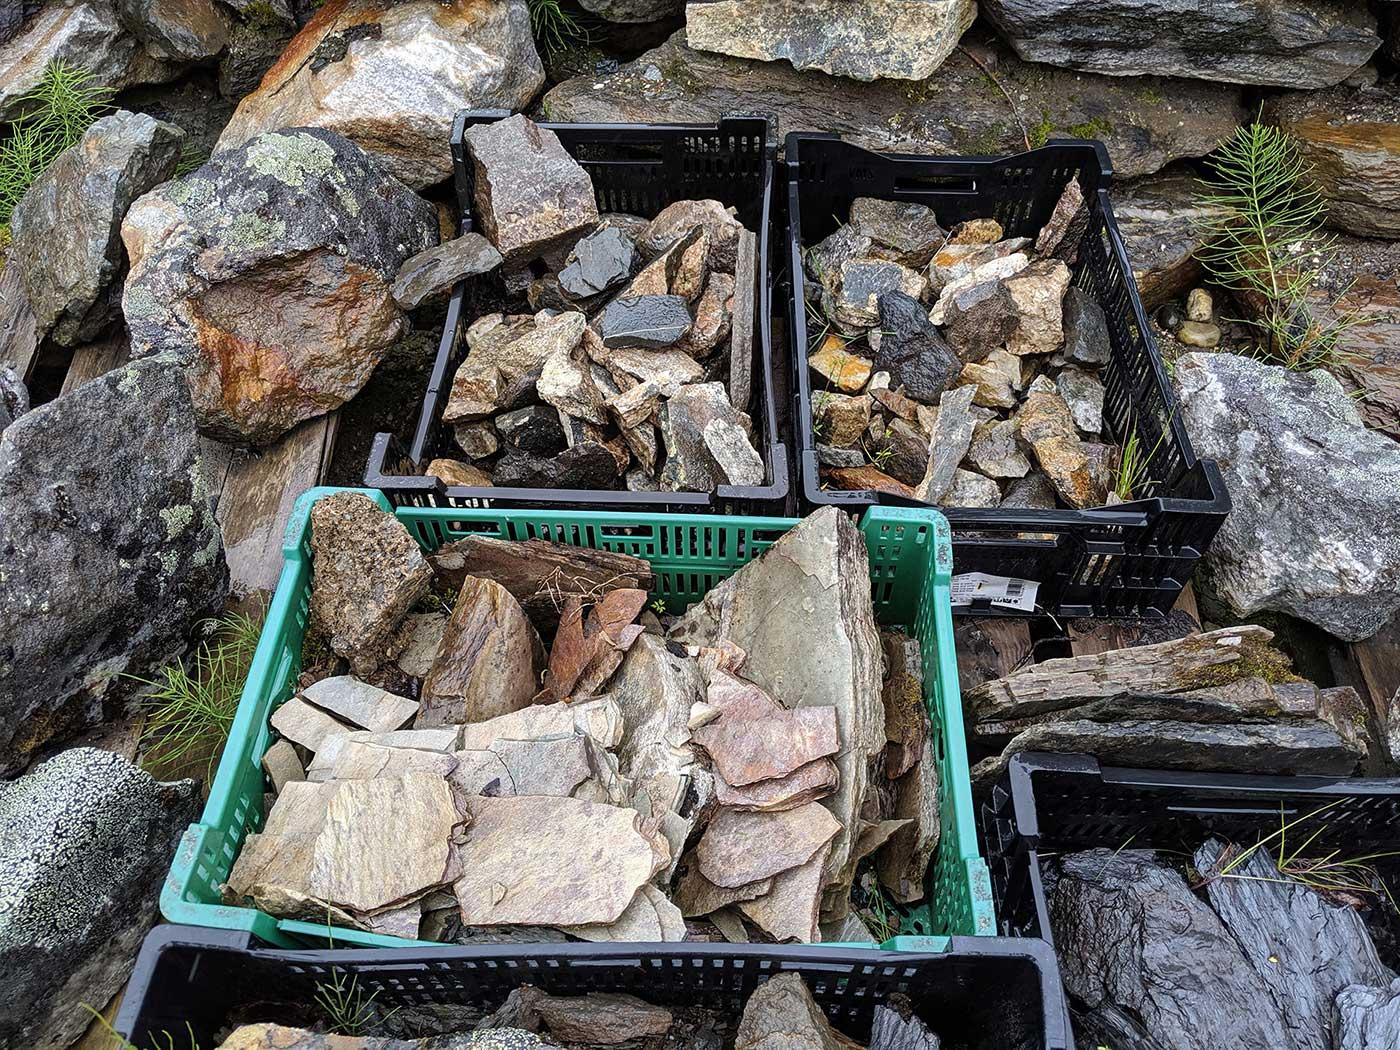 Rock samples are kept like plants in the nursery area